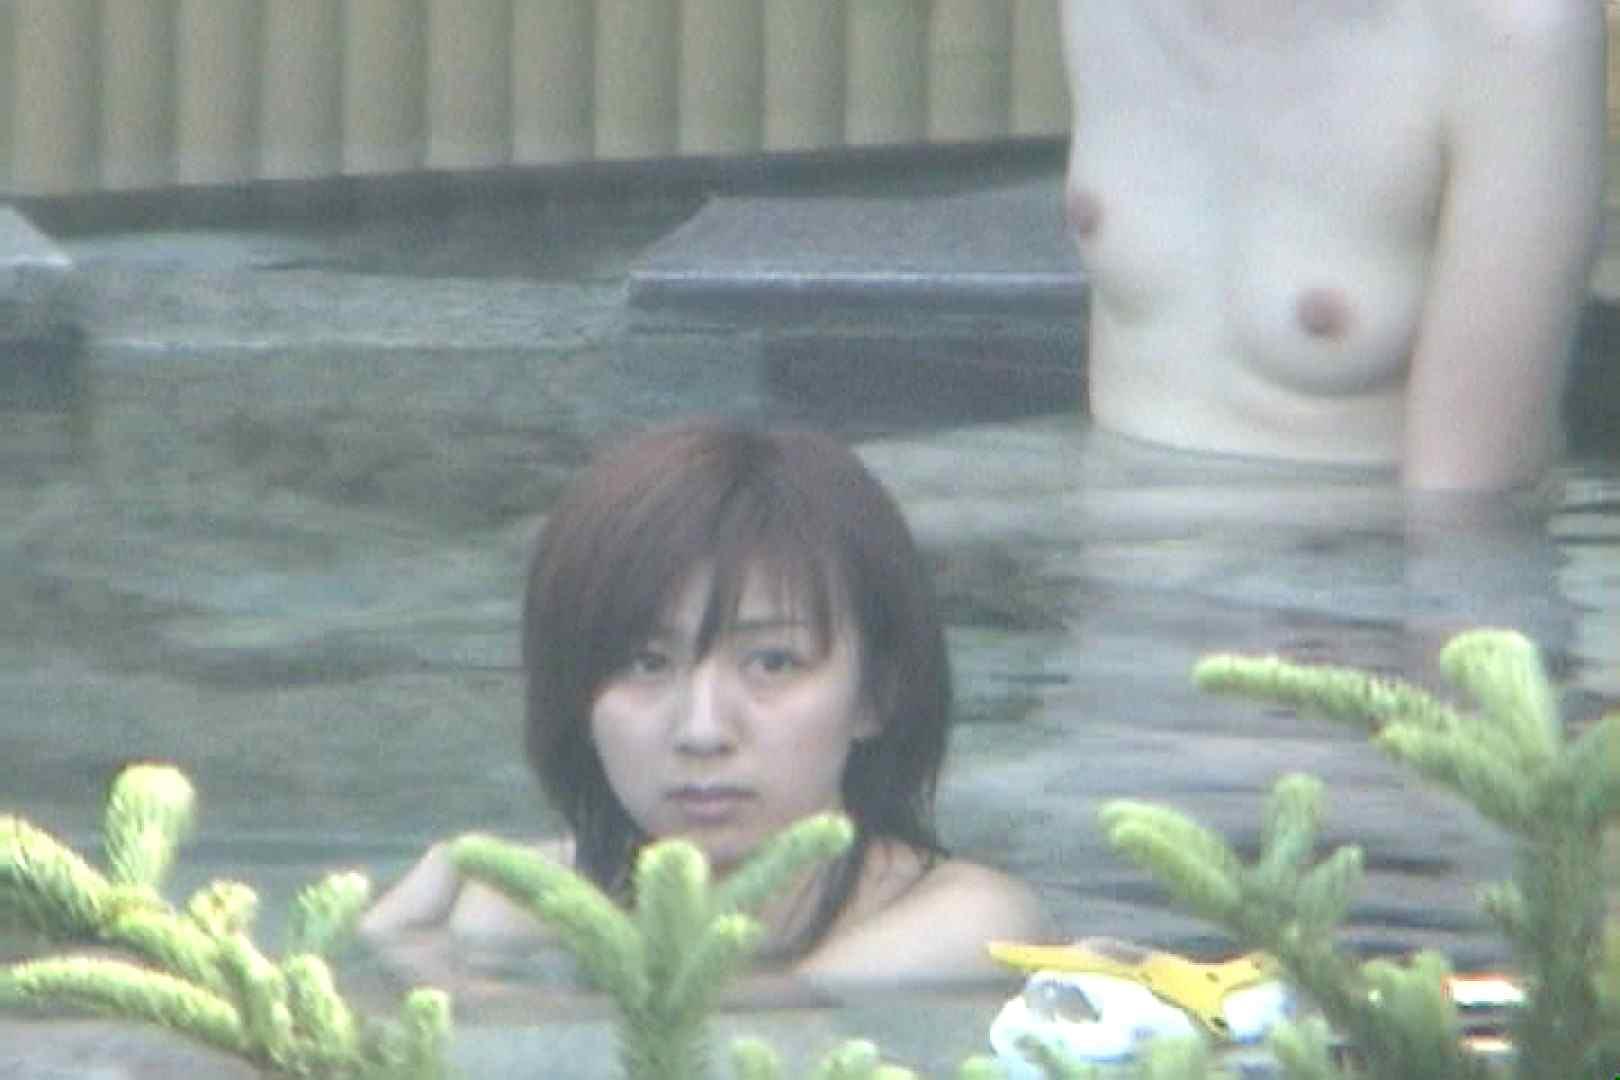 Aquaな露天風呂Vol.77【VIP限定】 露天   盗撮特集  98画像 73